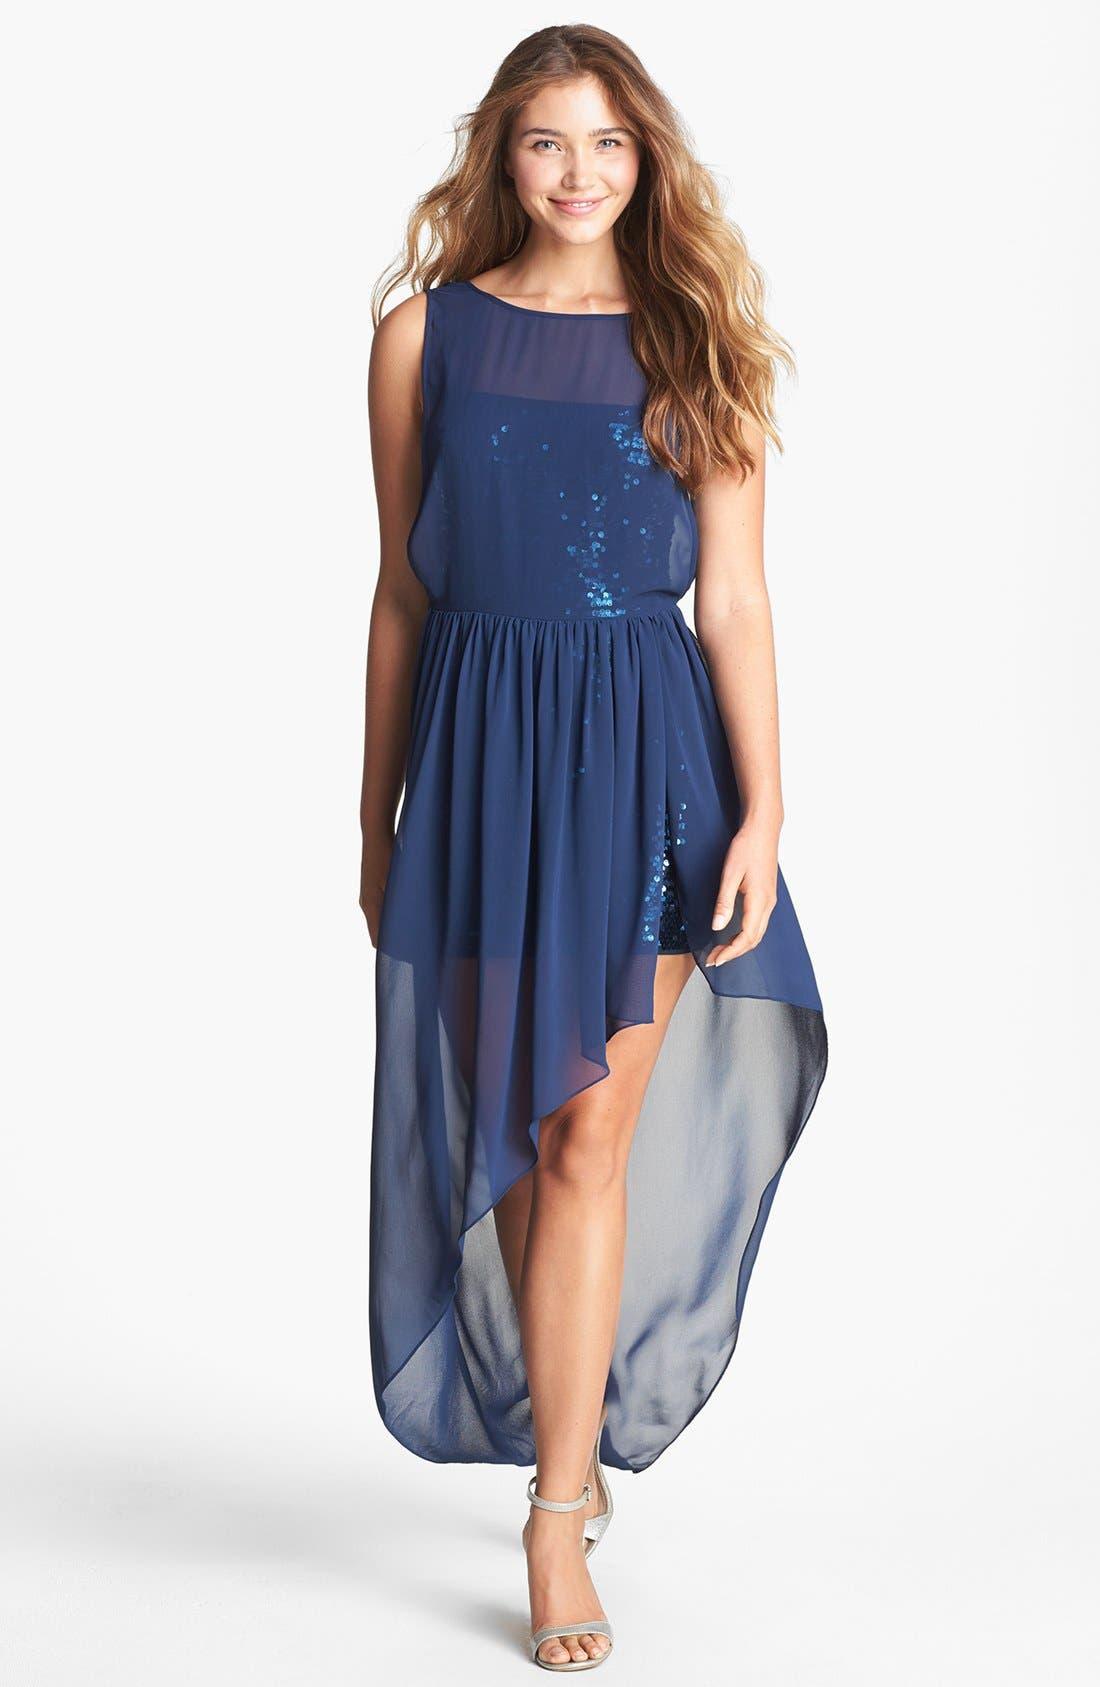 Alternate Image 1 Selected - BCBGMAXAZRIA Sequin & Sheer Chiffon High/Low Dress